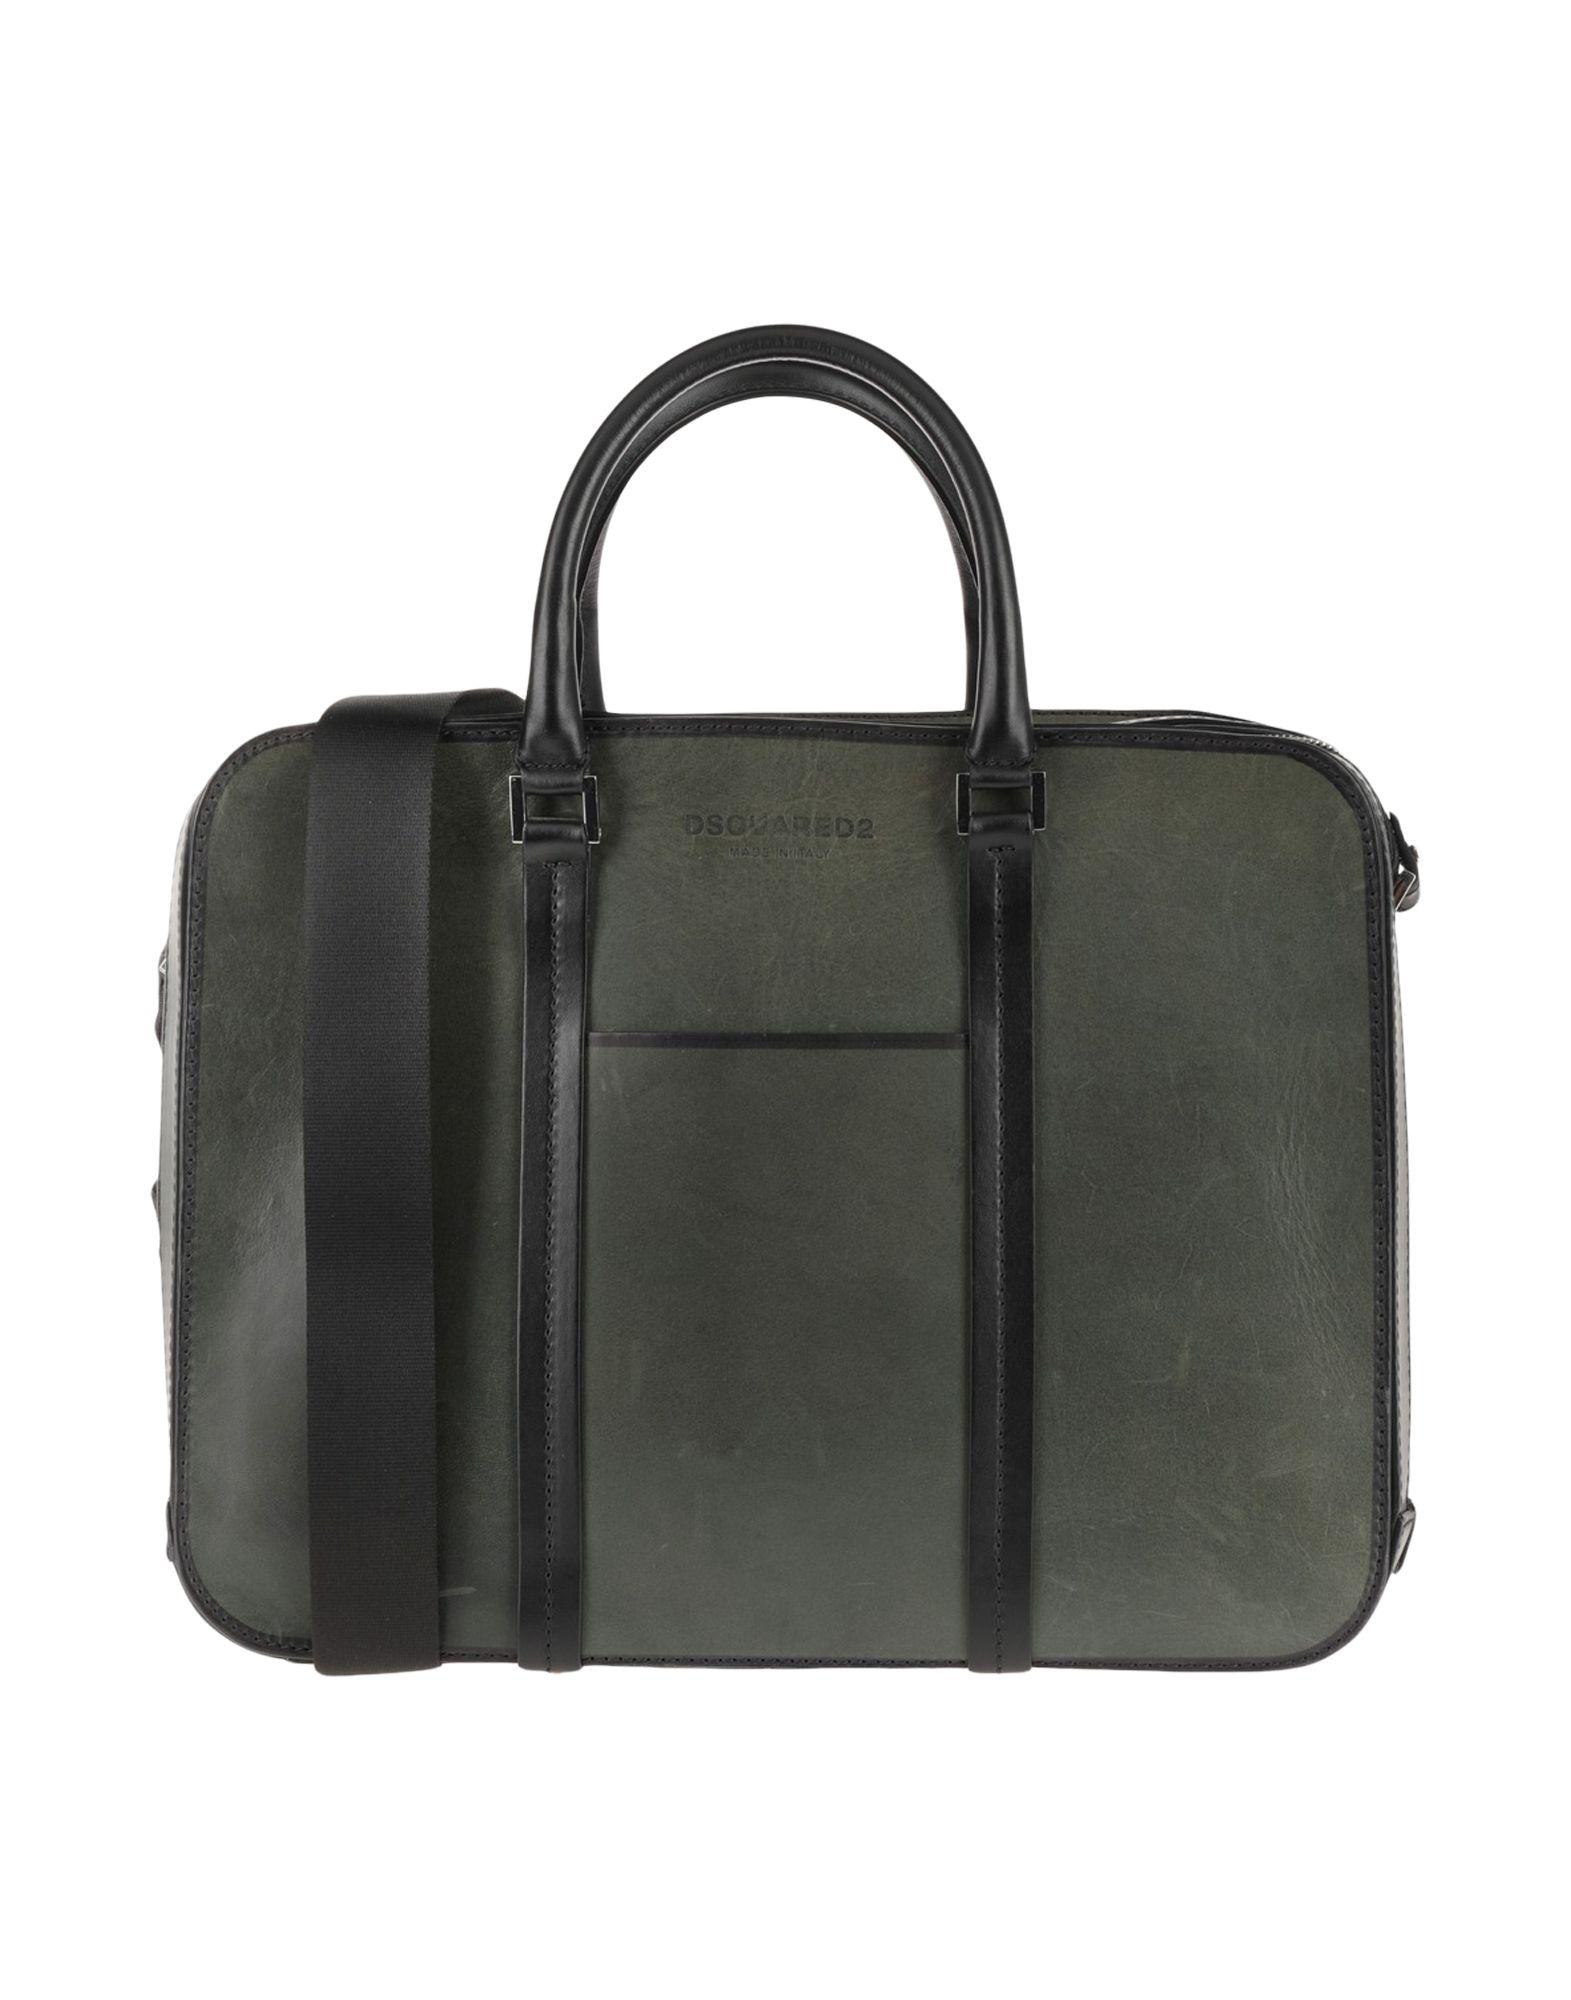 DSQUARED2 Деловые сумки сумка marina creazioni сумки деловые